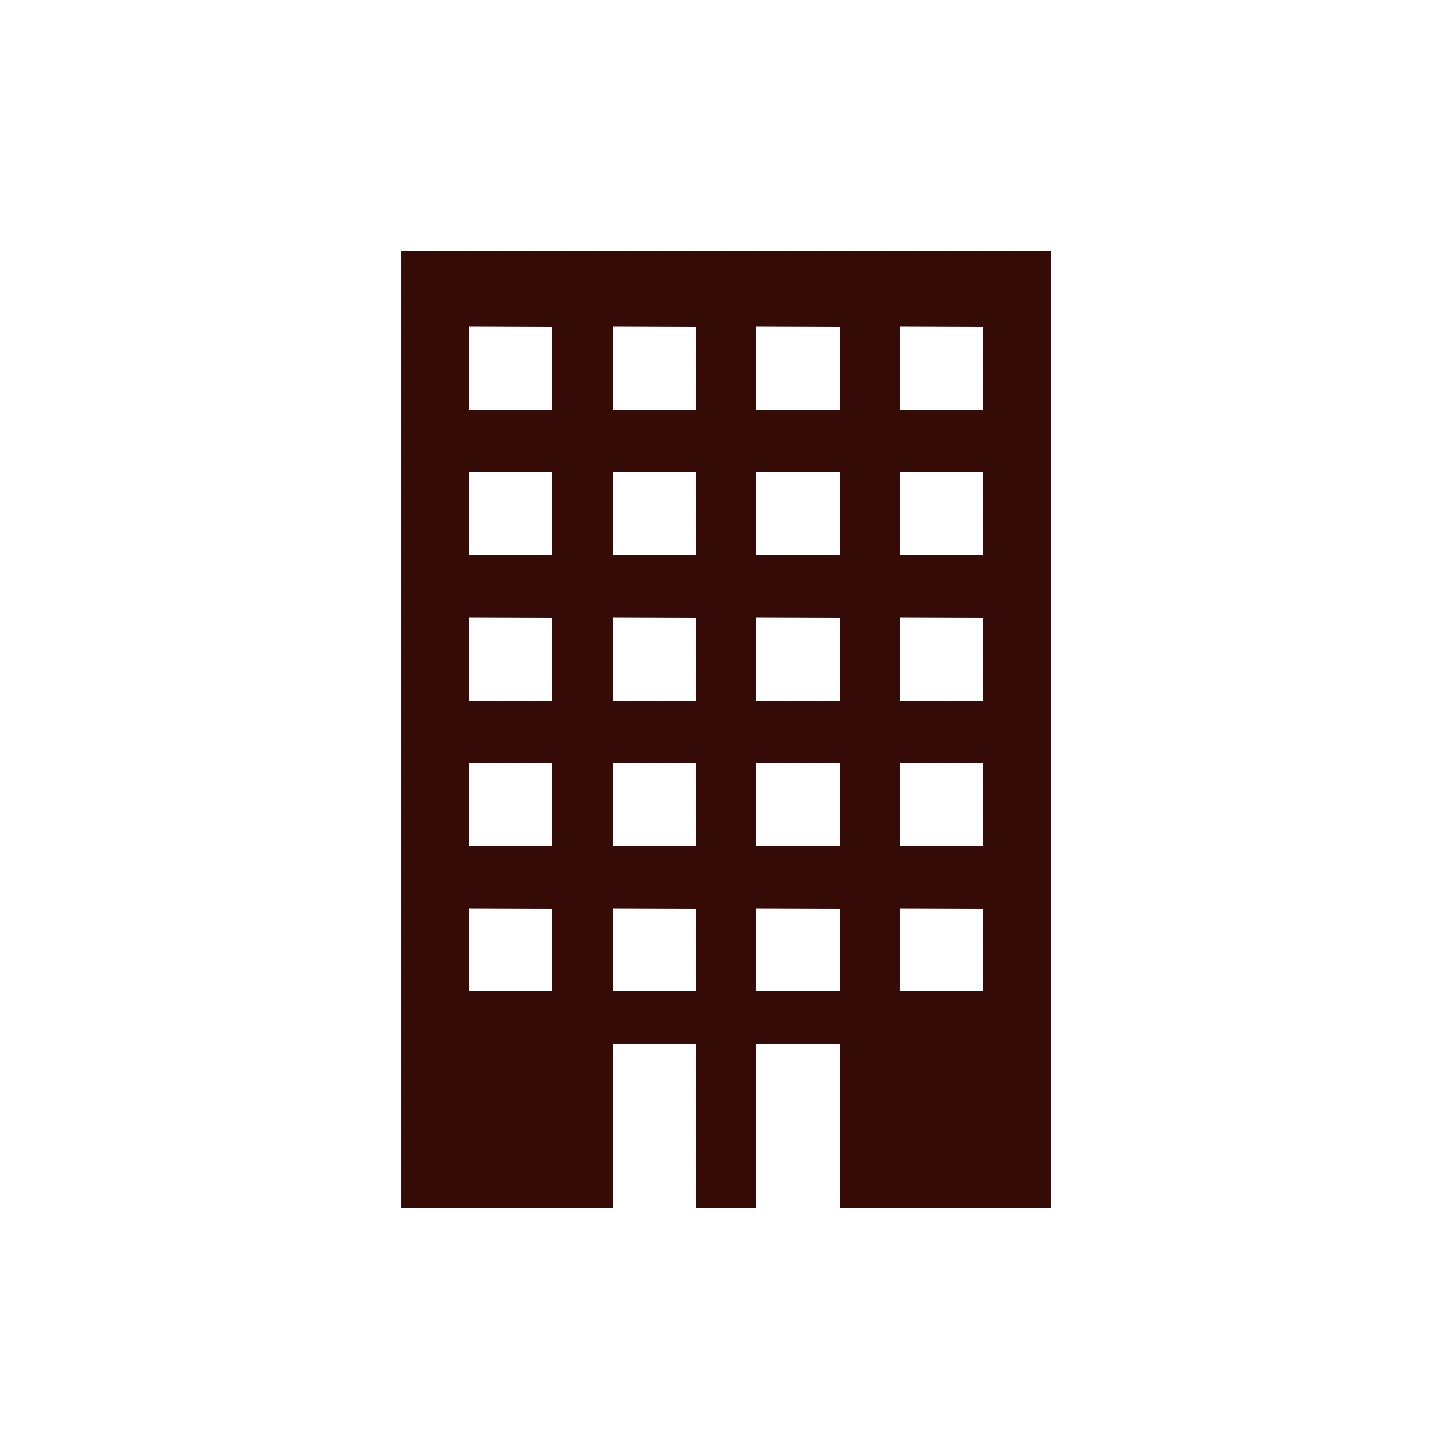 Geschosswohnungsbau